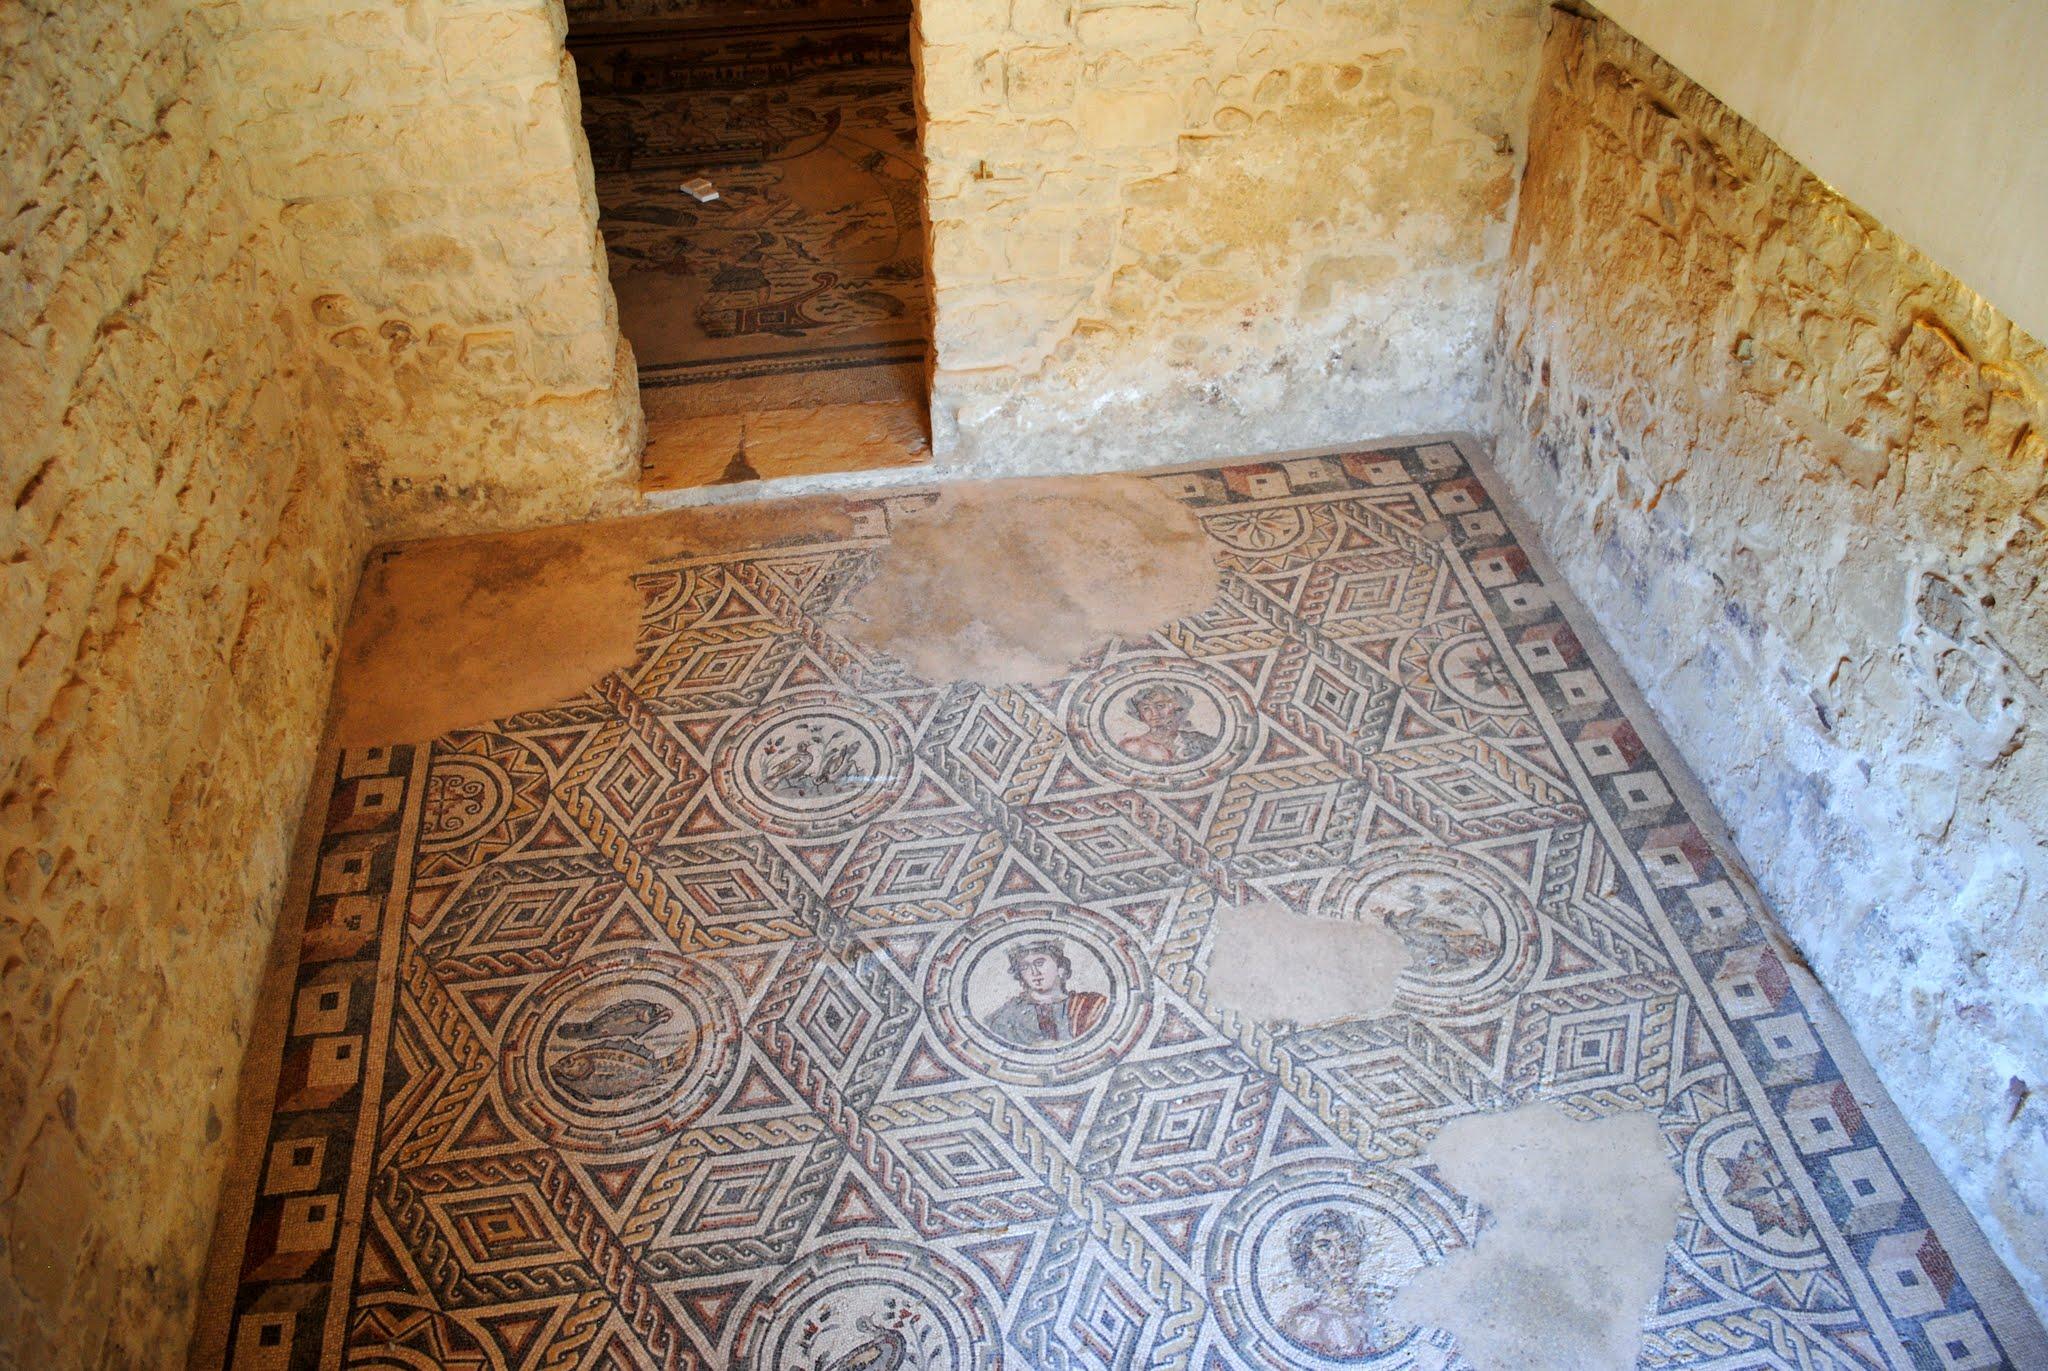 My Photos: Italy -- Mosaics -- Sicily -- Piazza Armerina -- The Four Seasons Mosaic